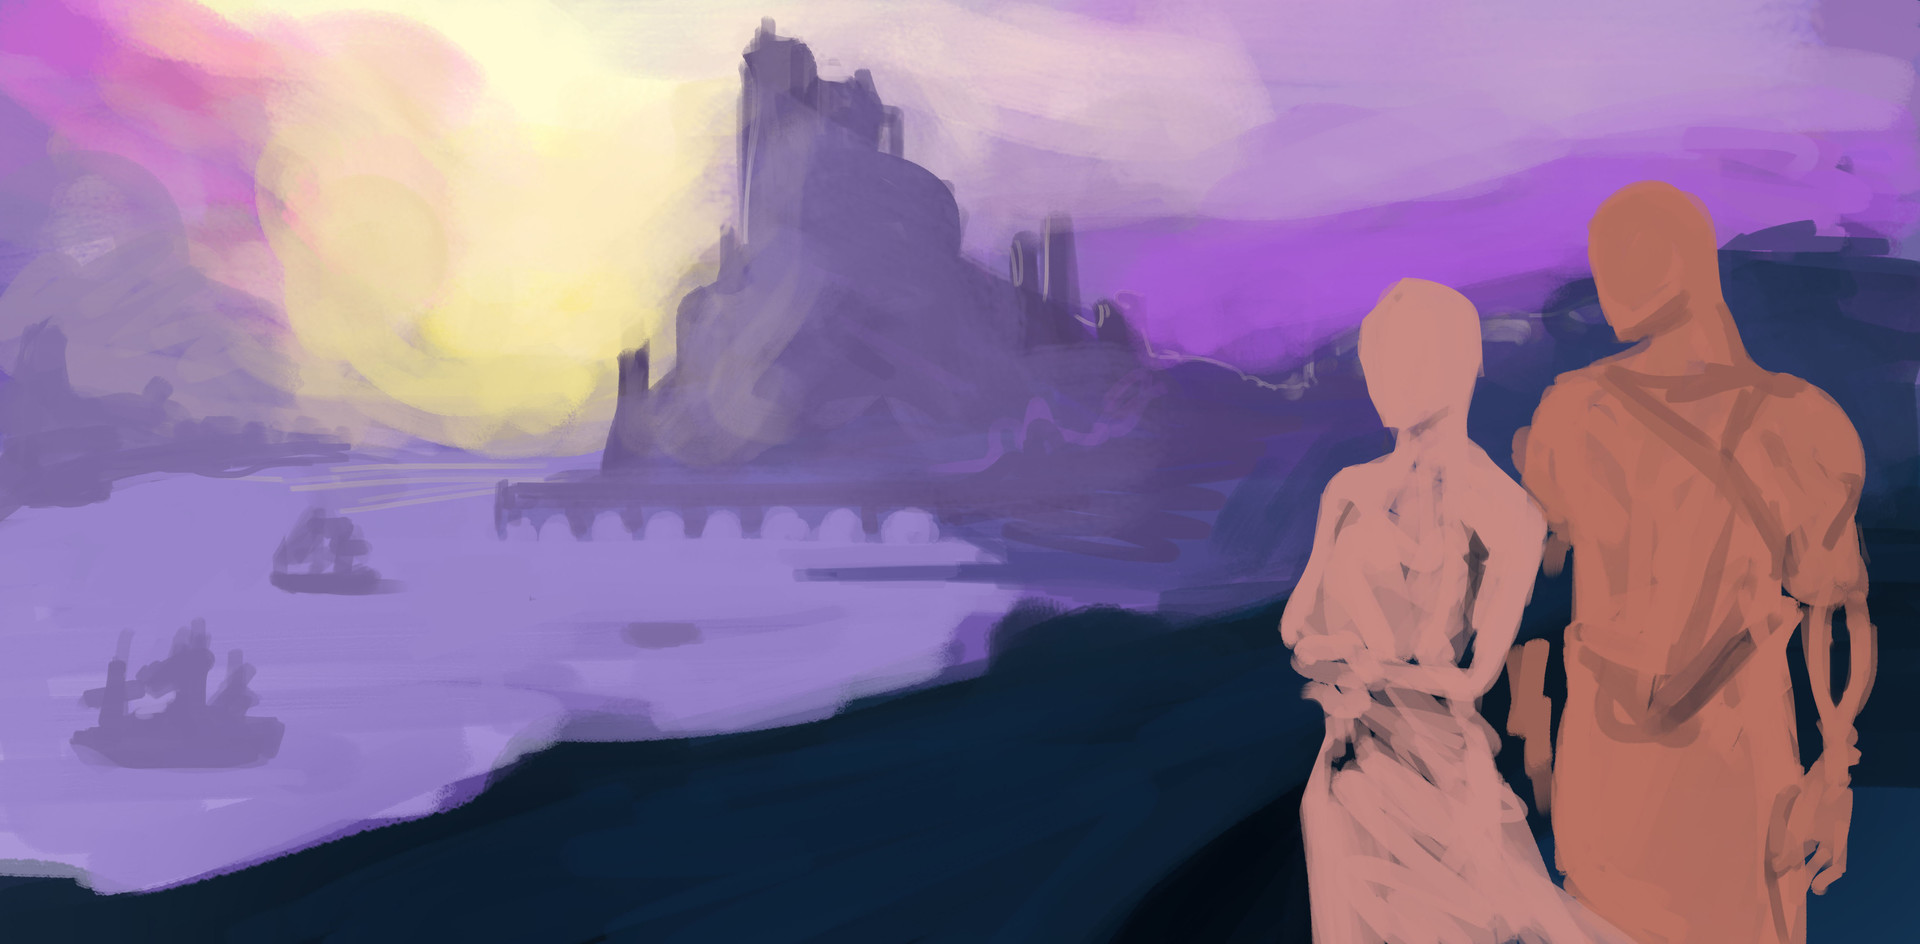 Shellz art kingdom 2